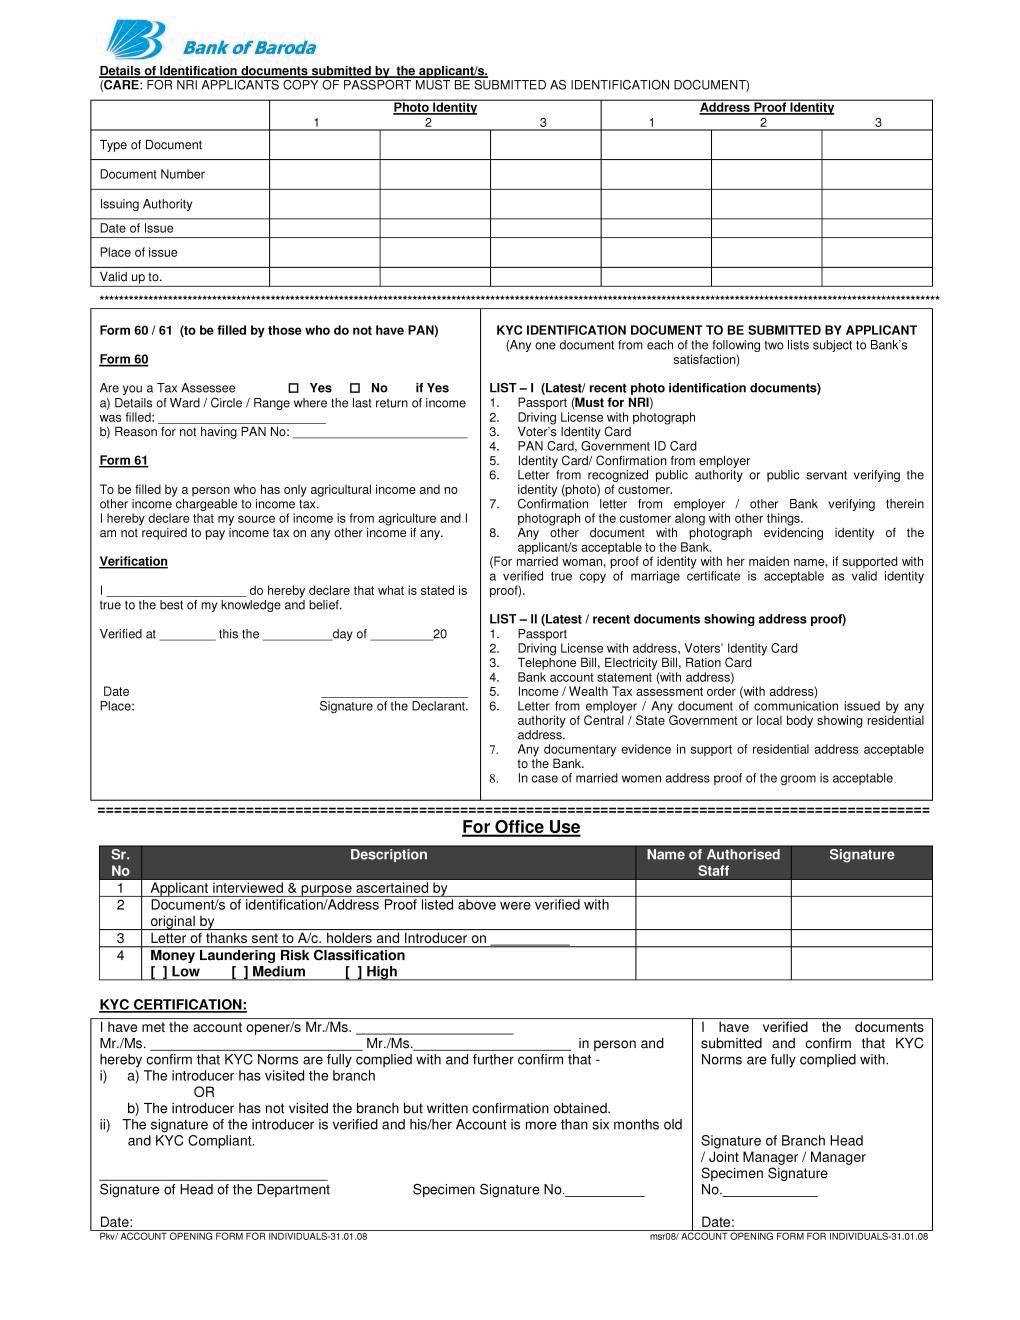 application form bank of baroda baroda account form  Bank of baroda, Baroda, Accounting